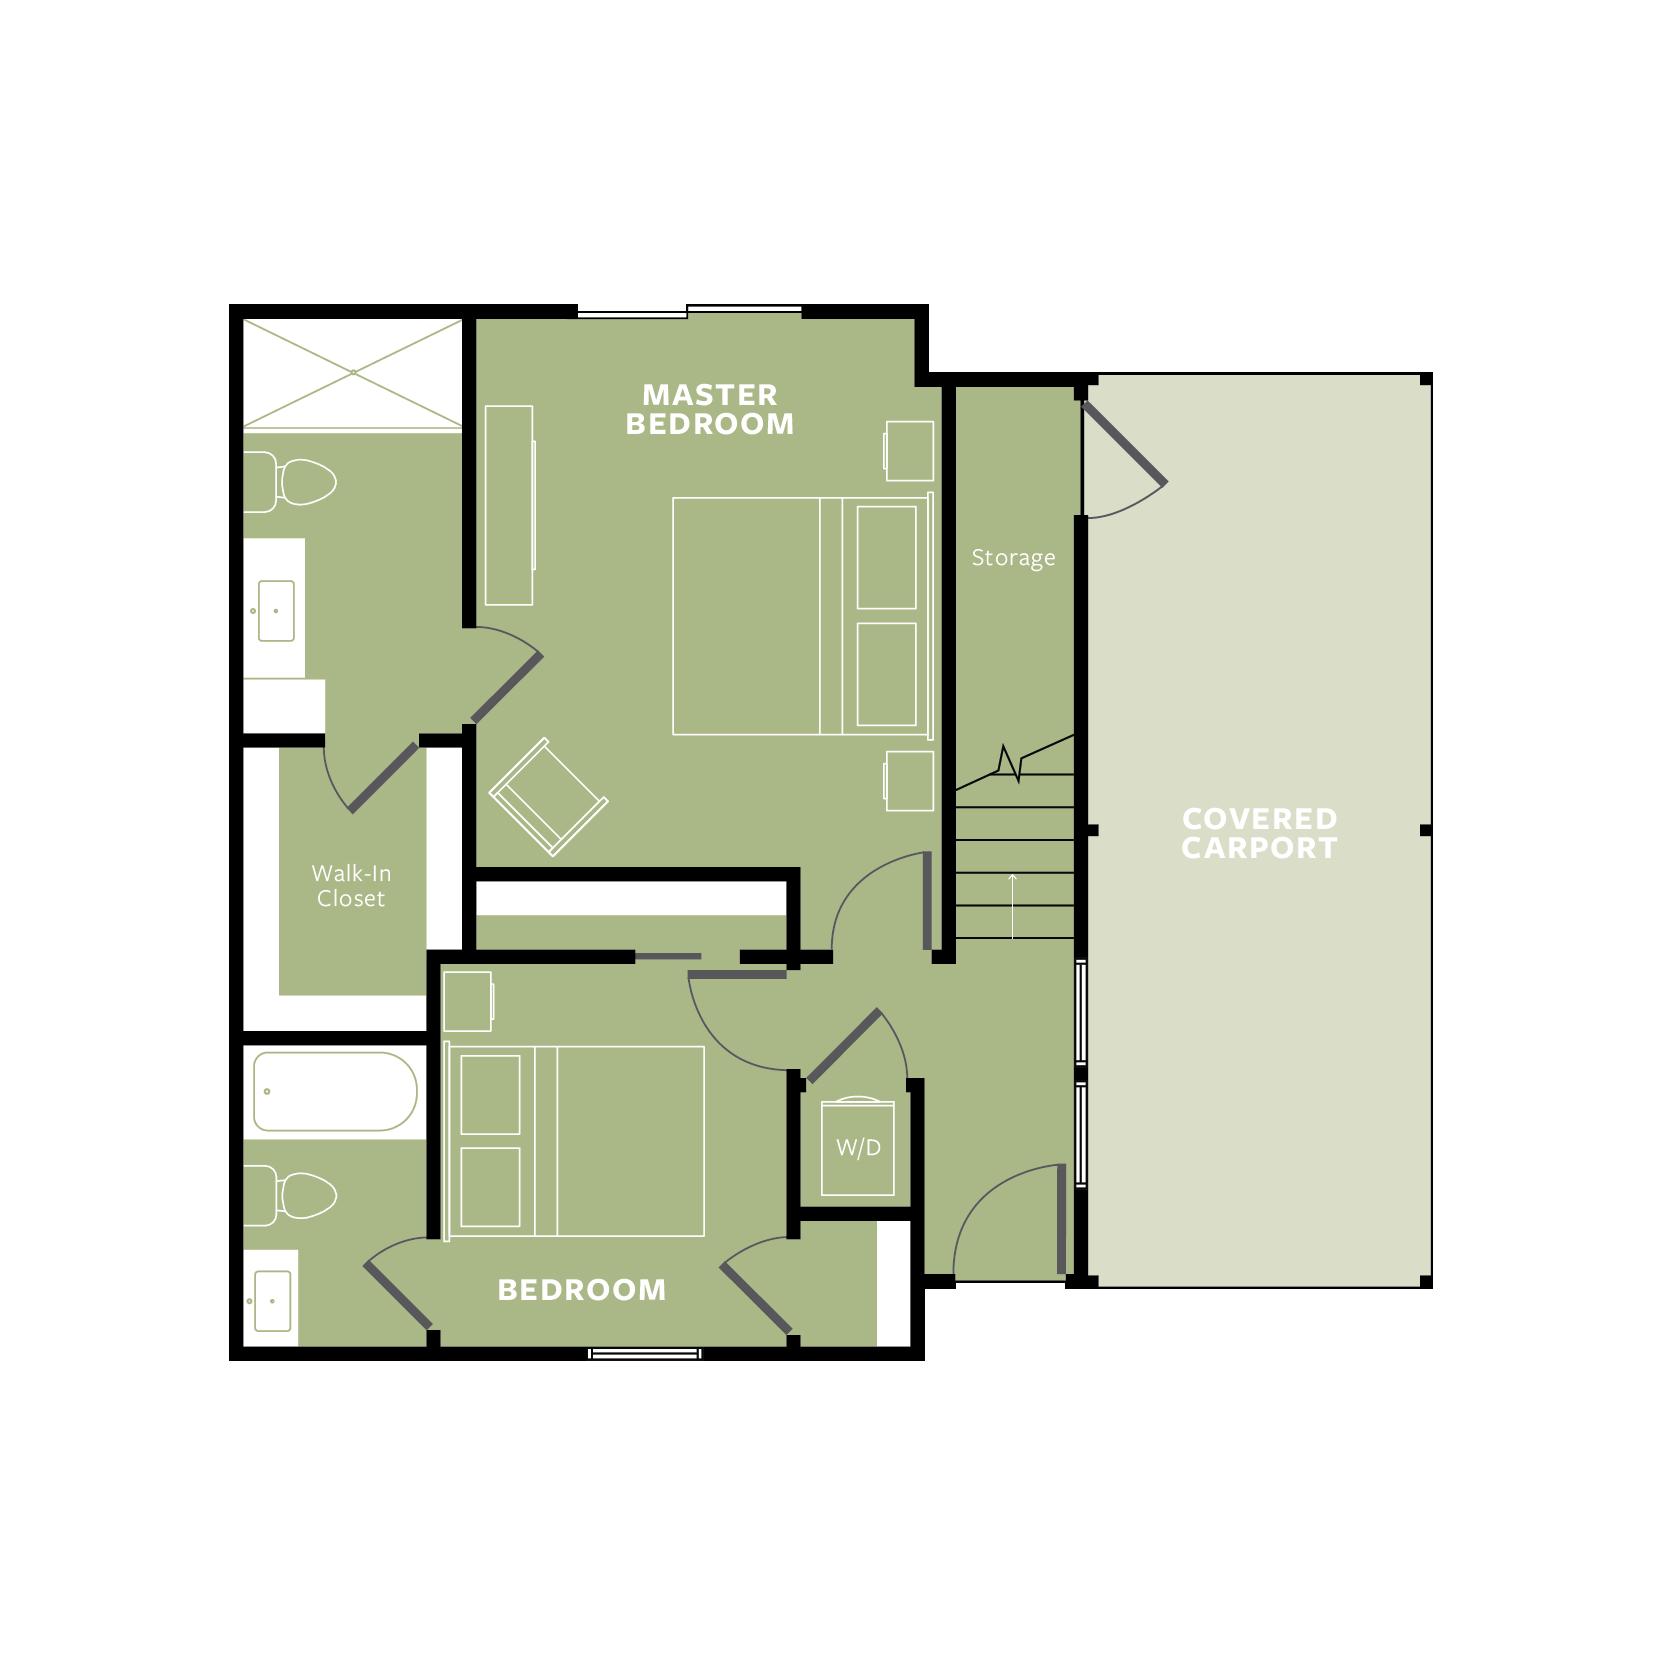 GREEN: Ground Floor